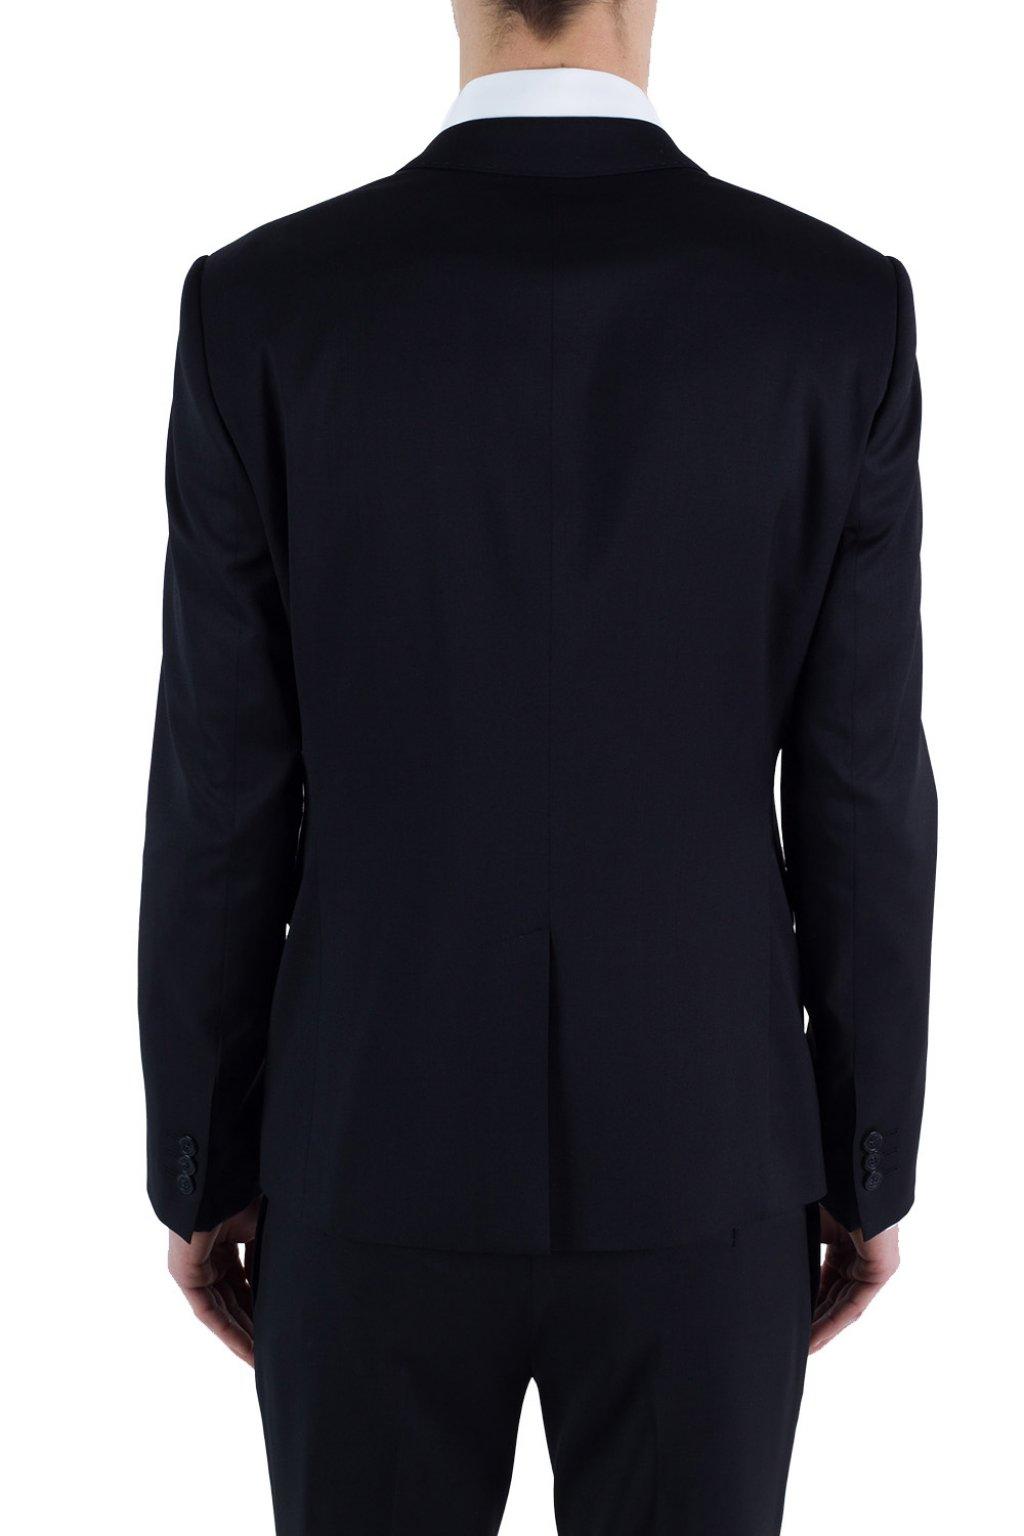 Emporio Armani Wool suit